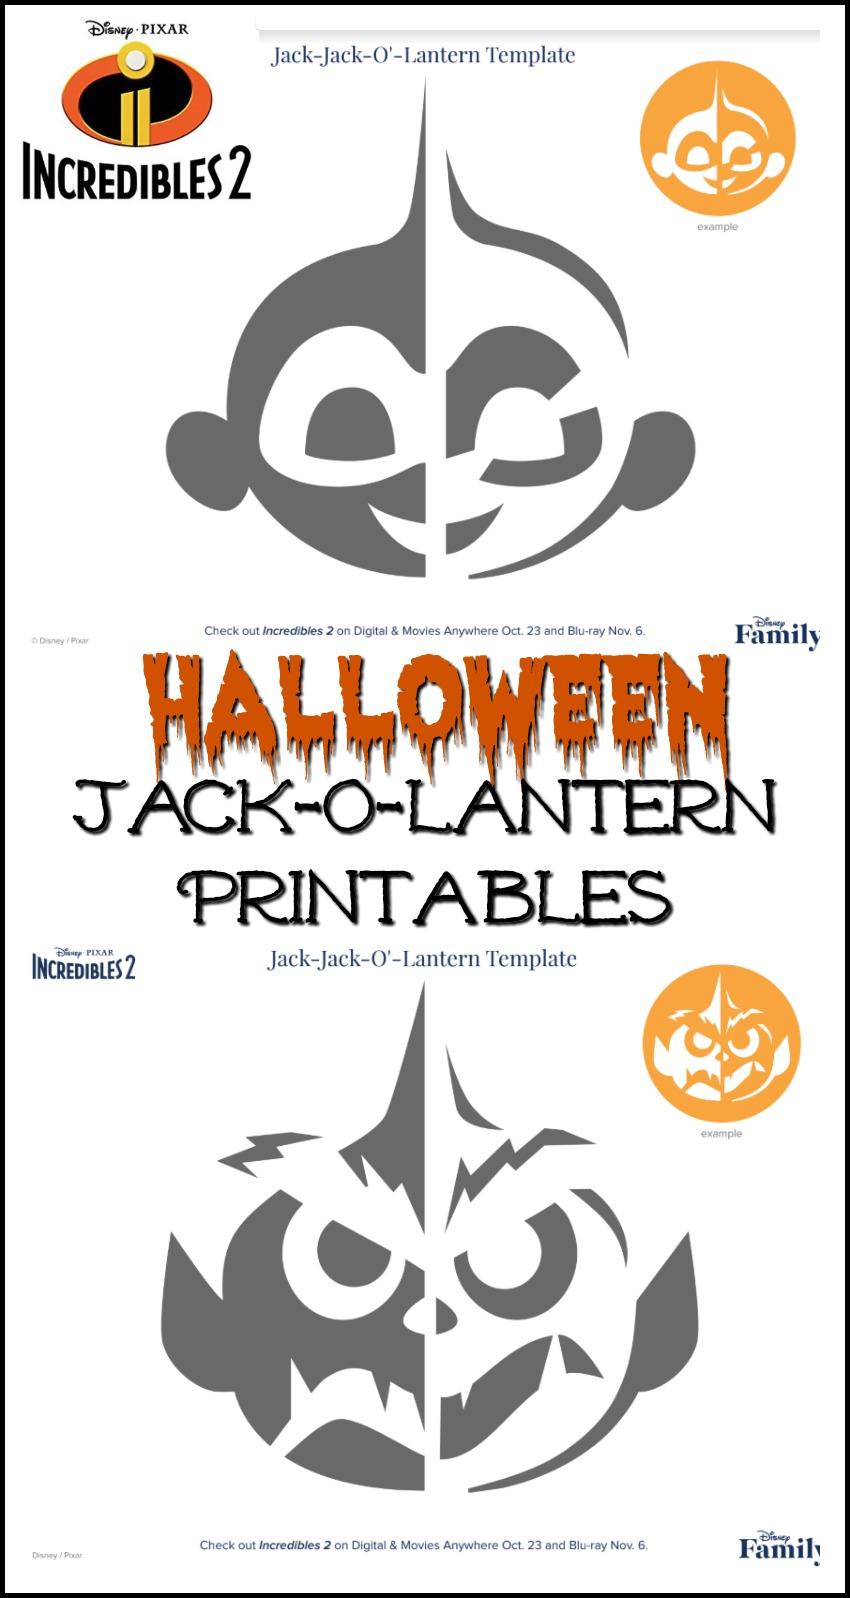 Incredible 2 Halloween Printables #halloween Incredibles2 #printables